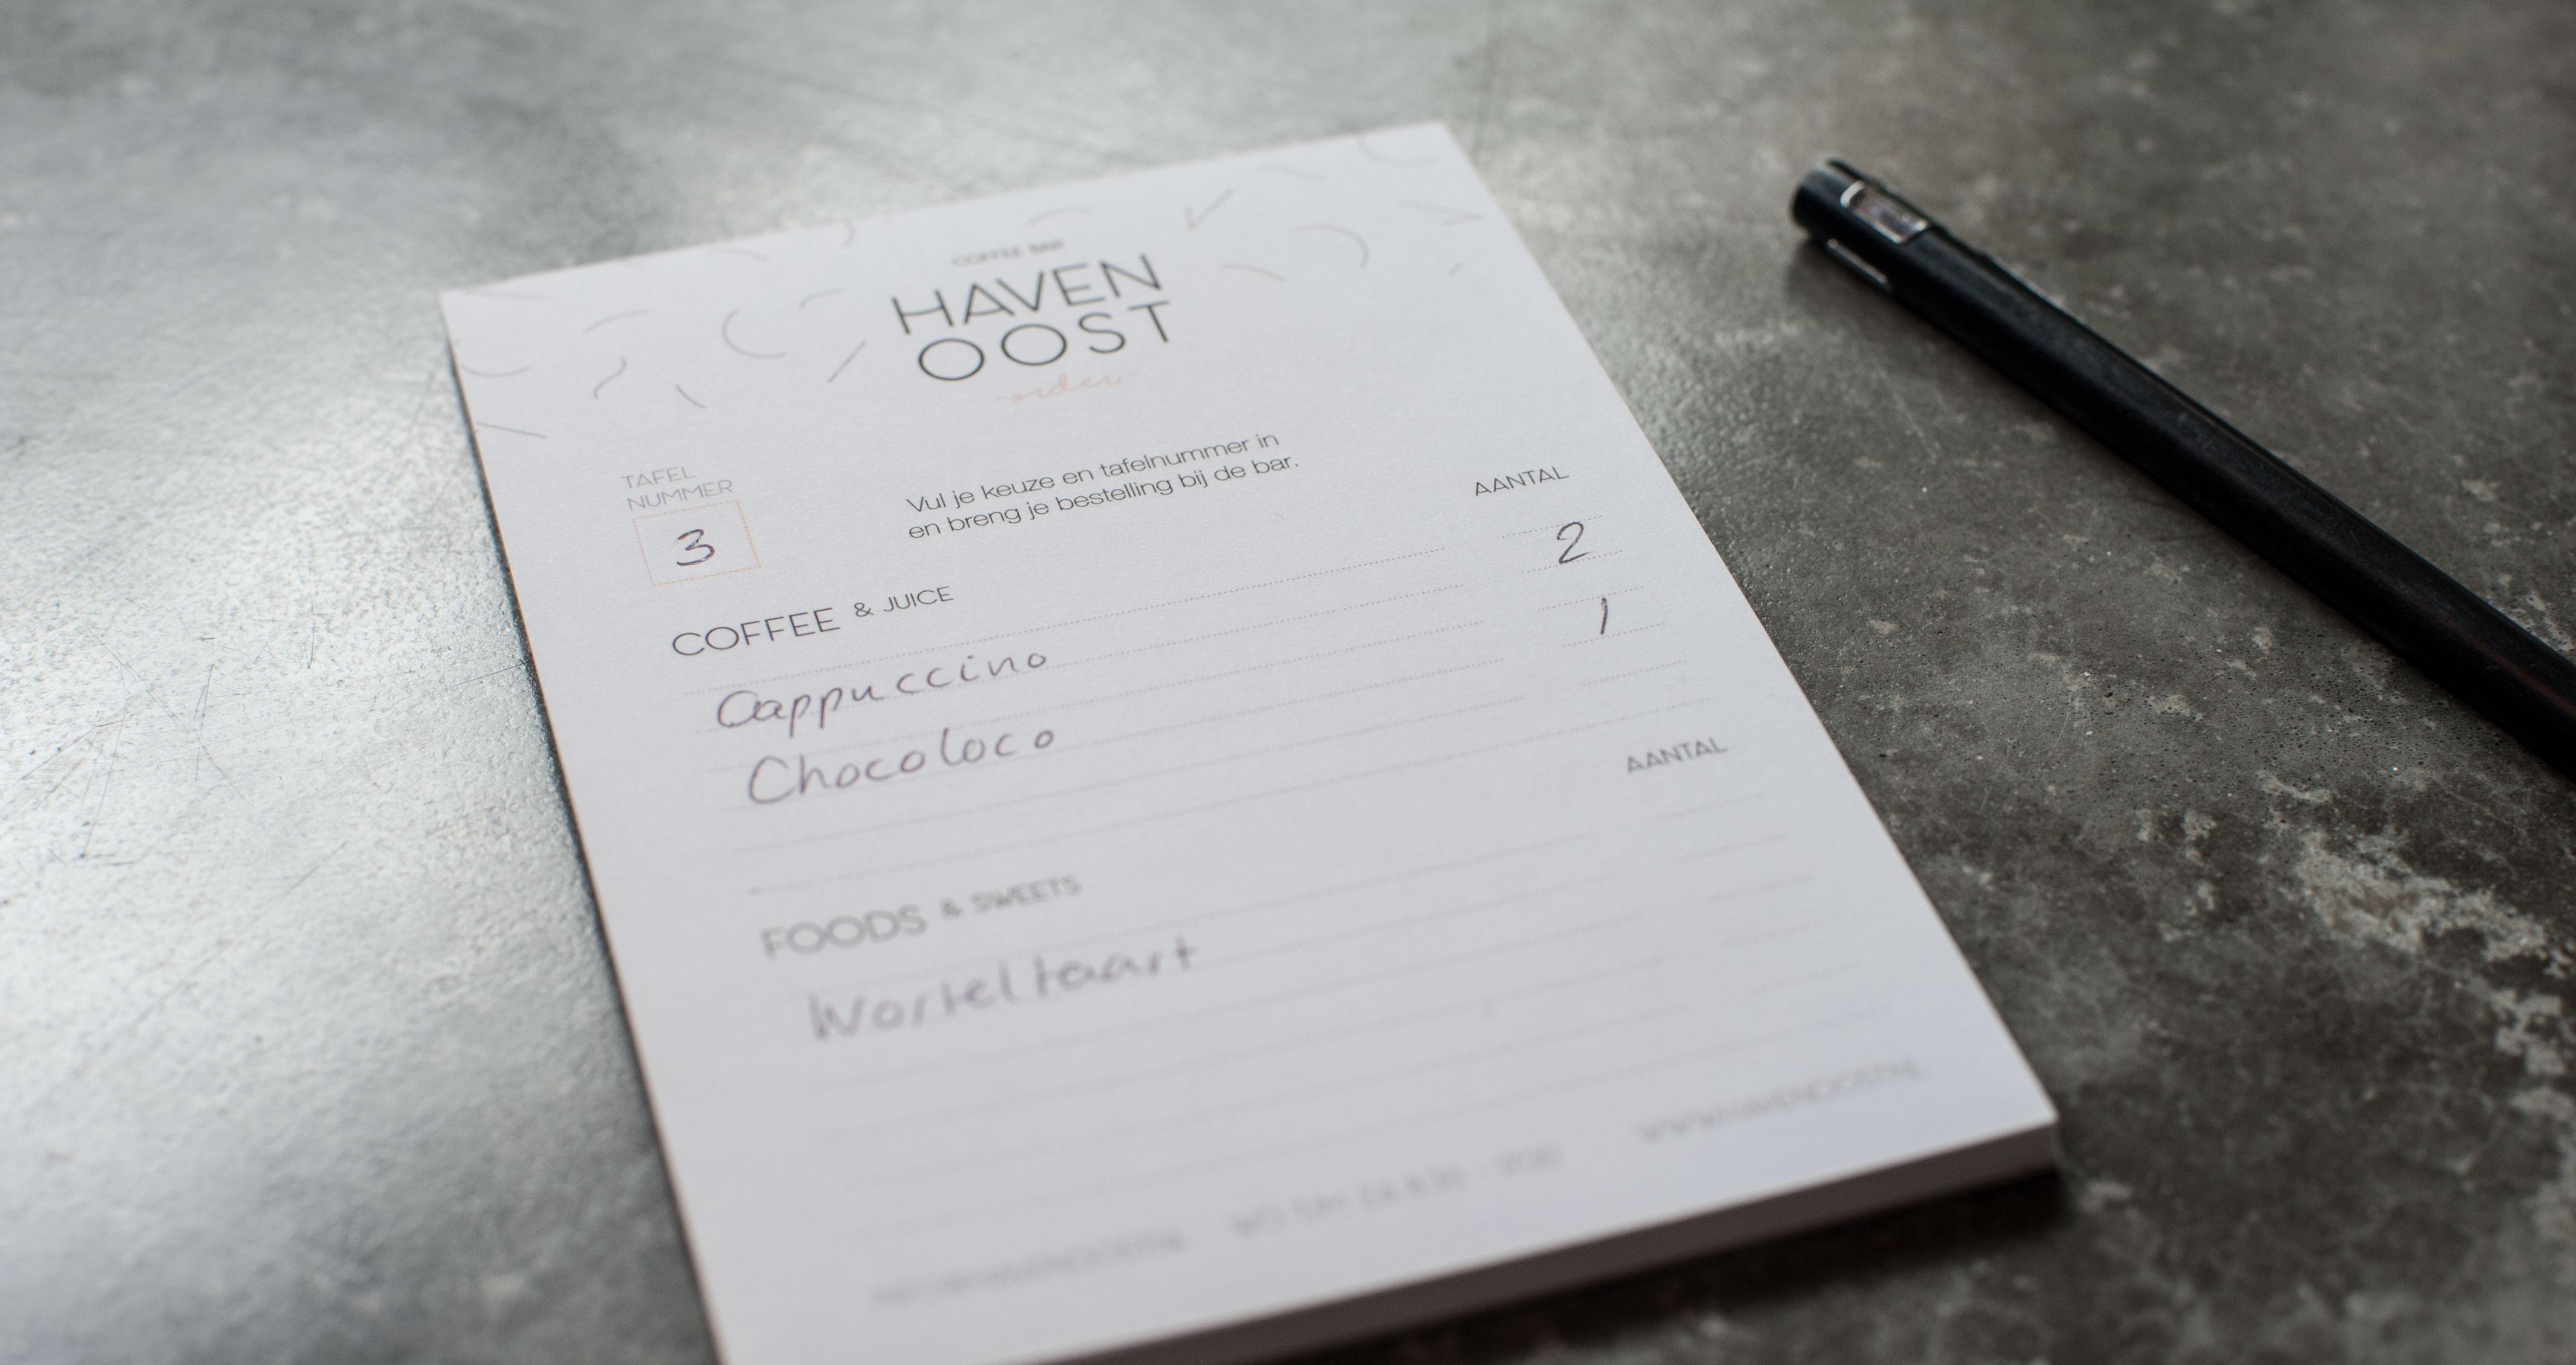 order_havenoost